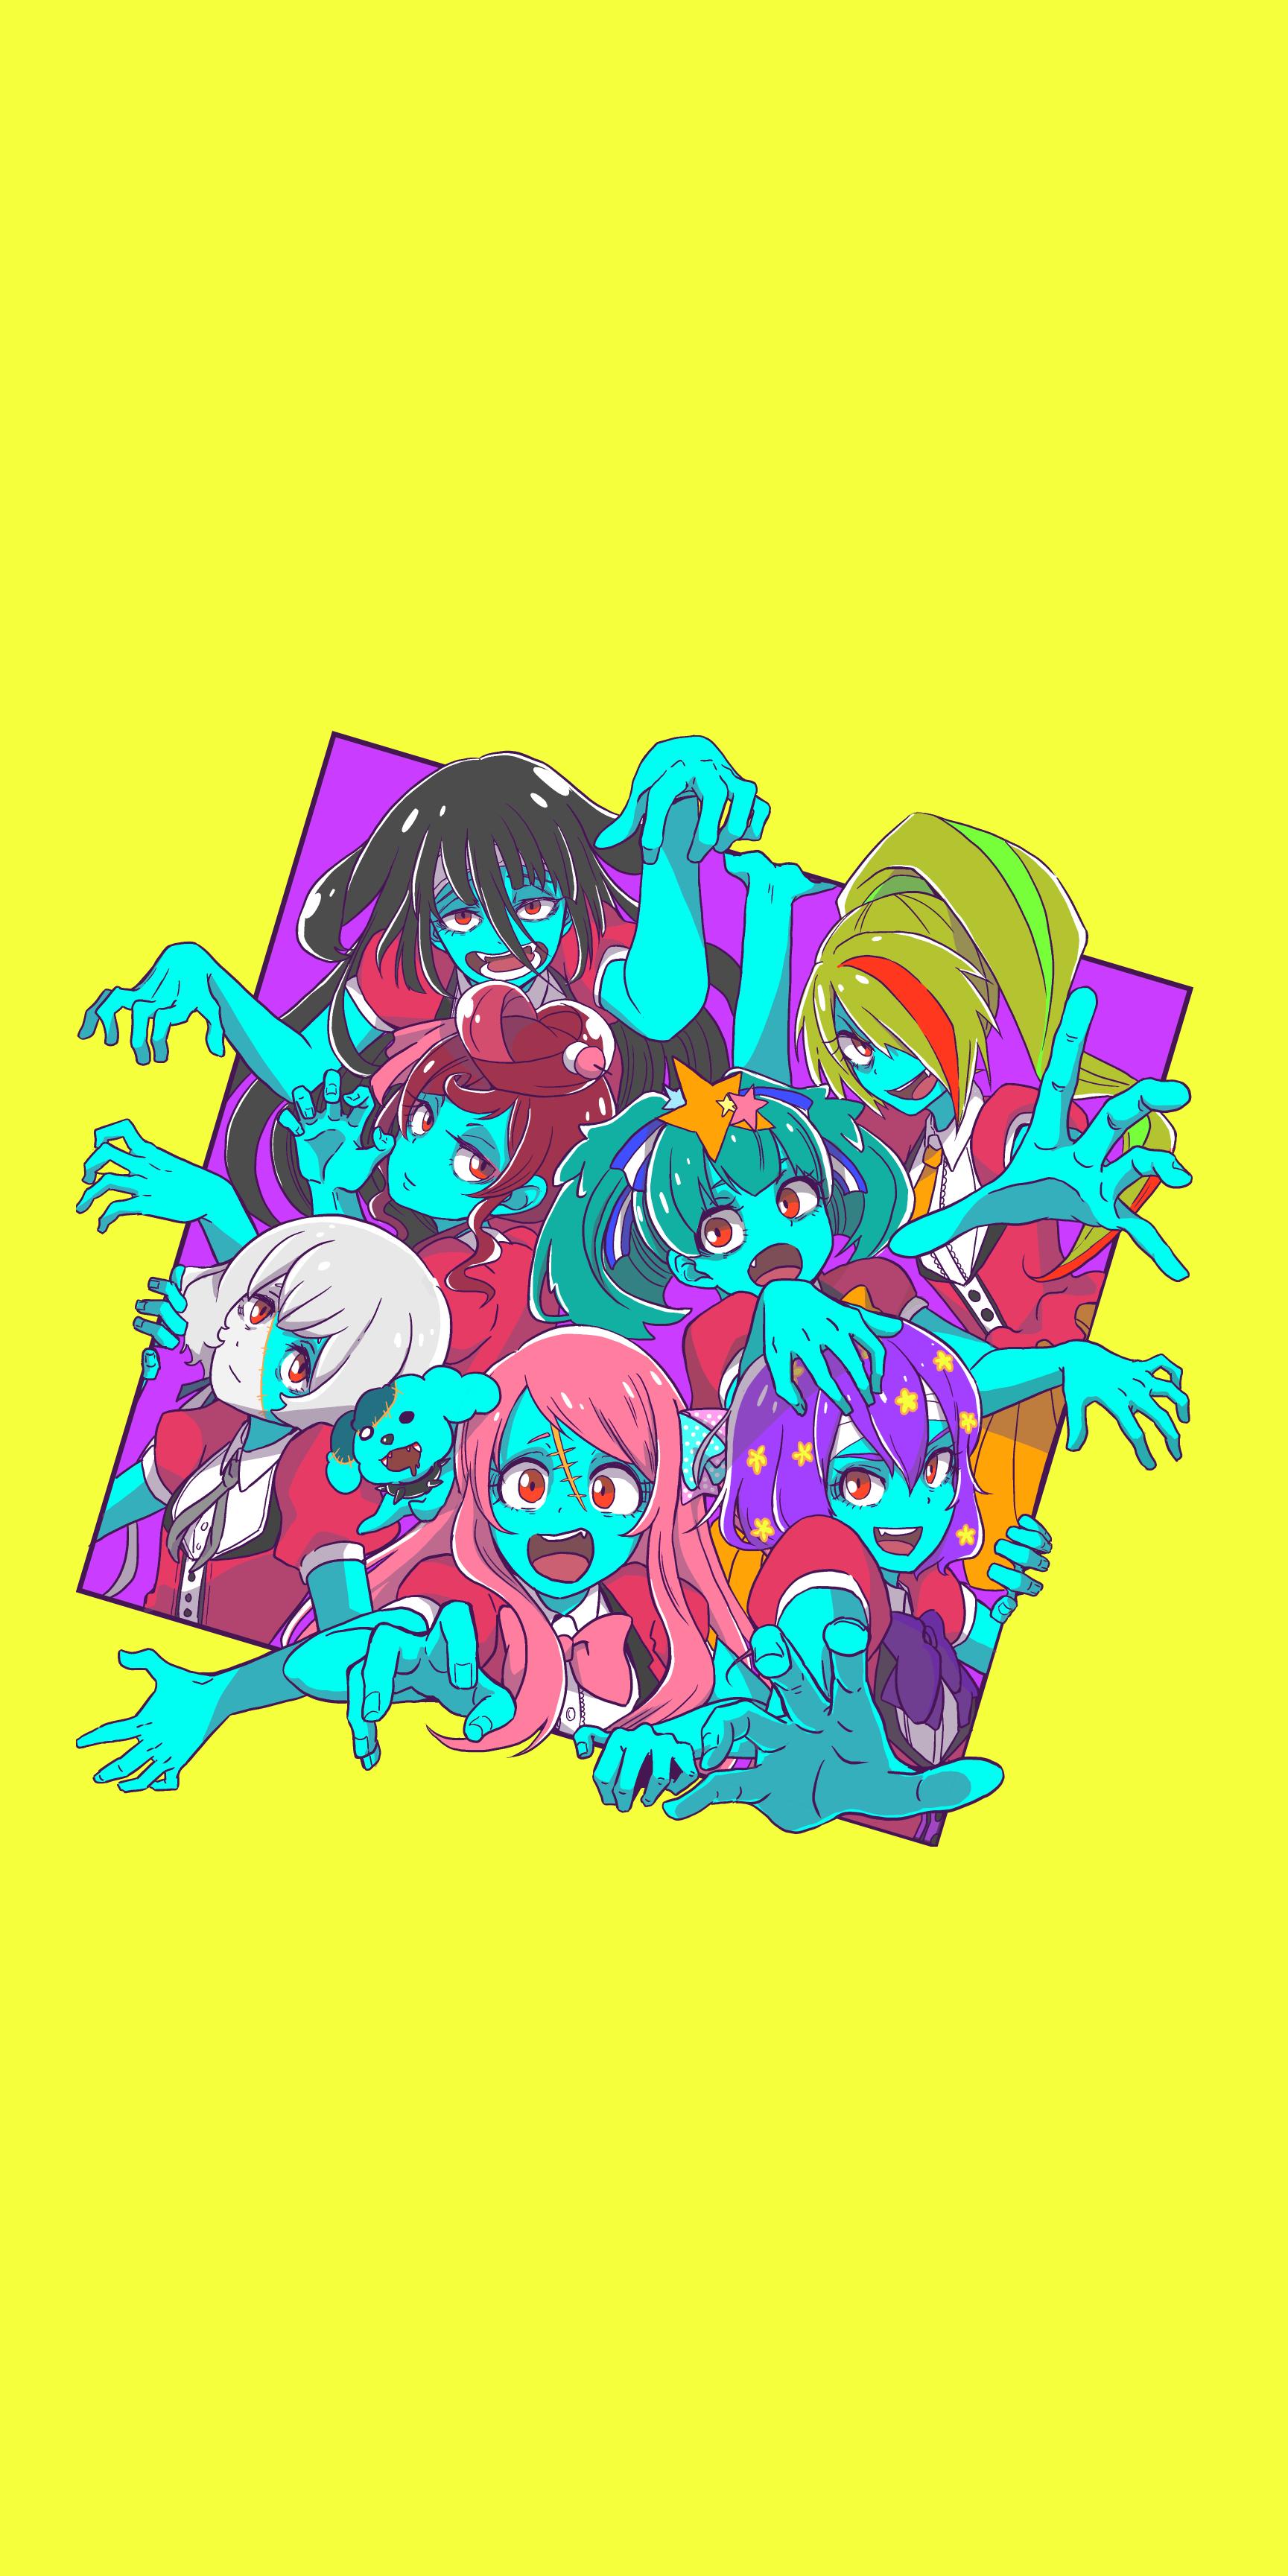 Zombieland Saga Anime Images Fondo De Anime Anime